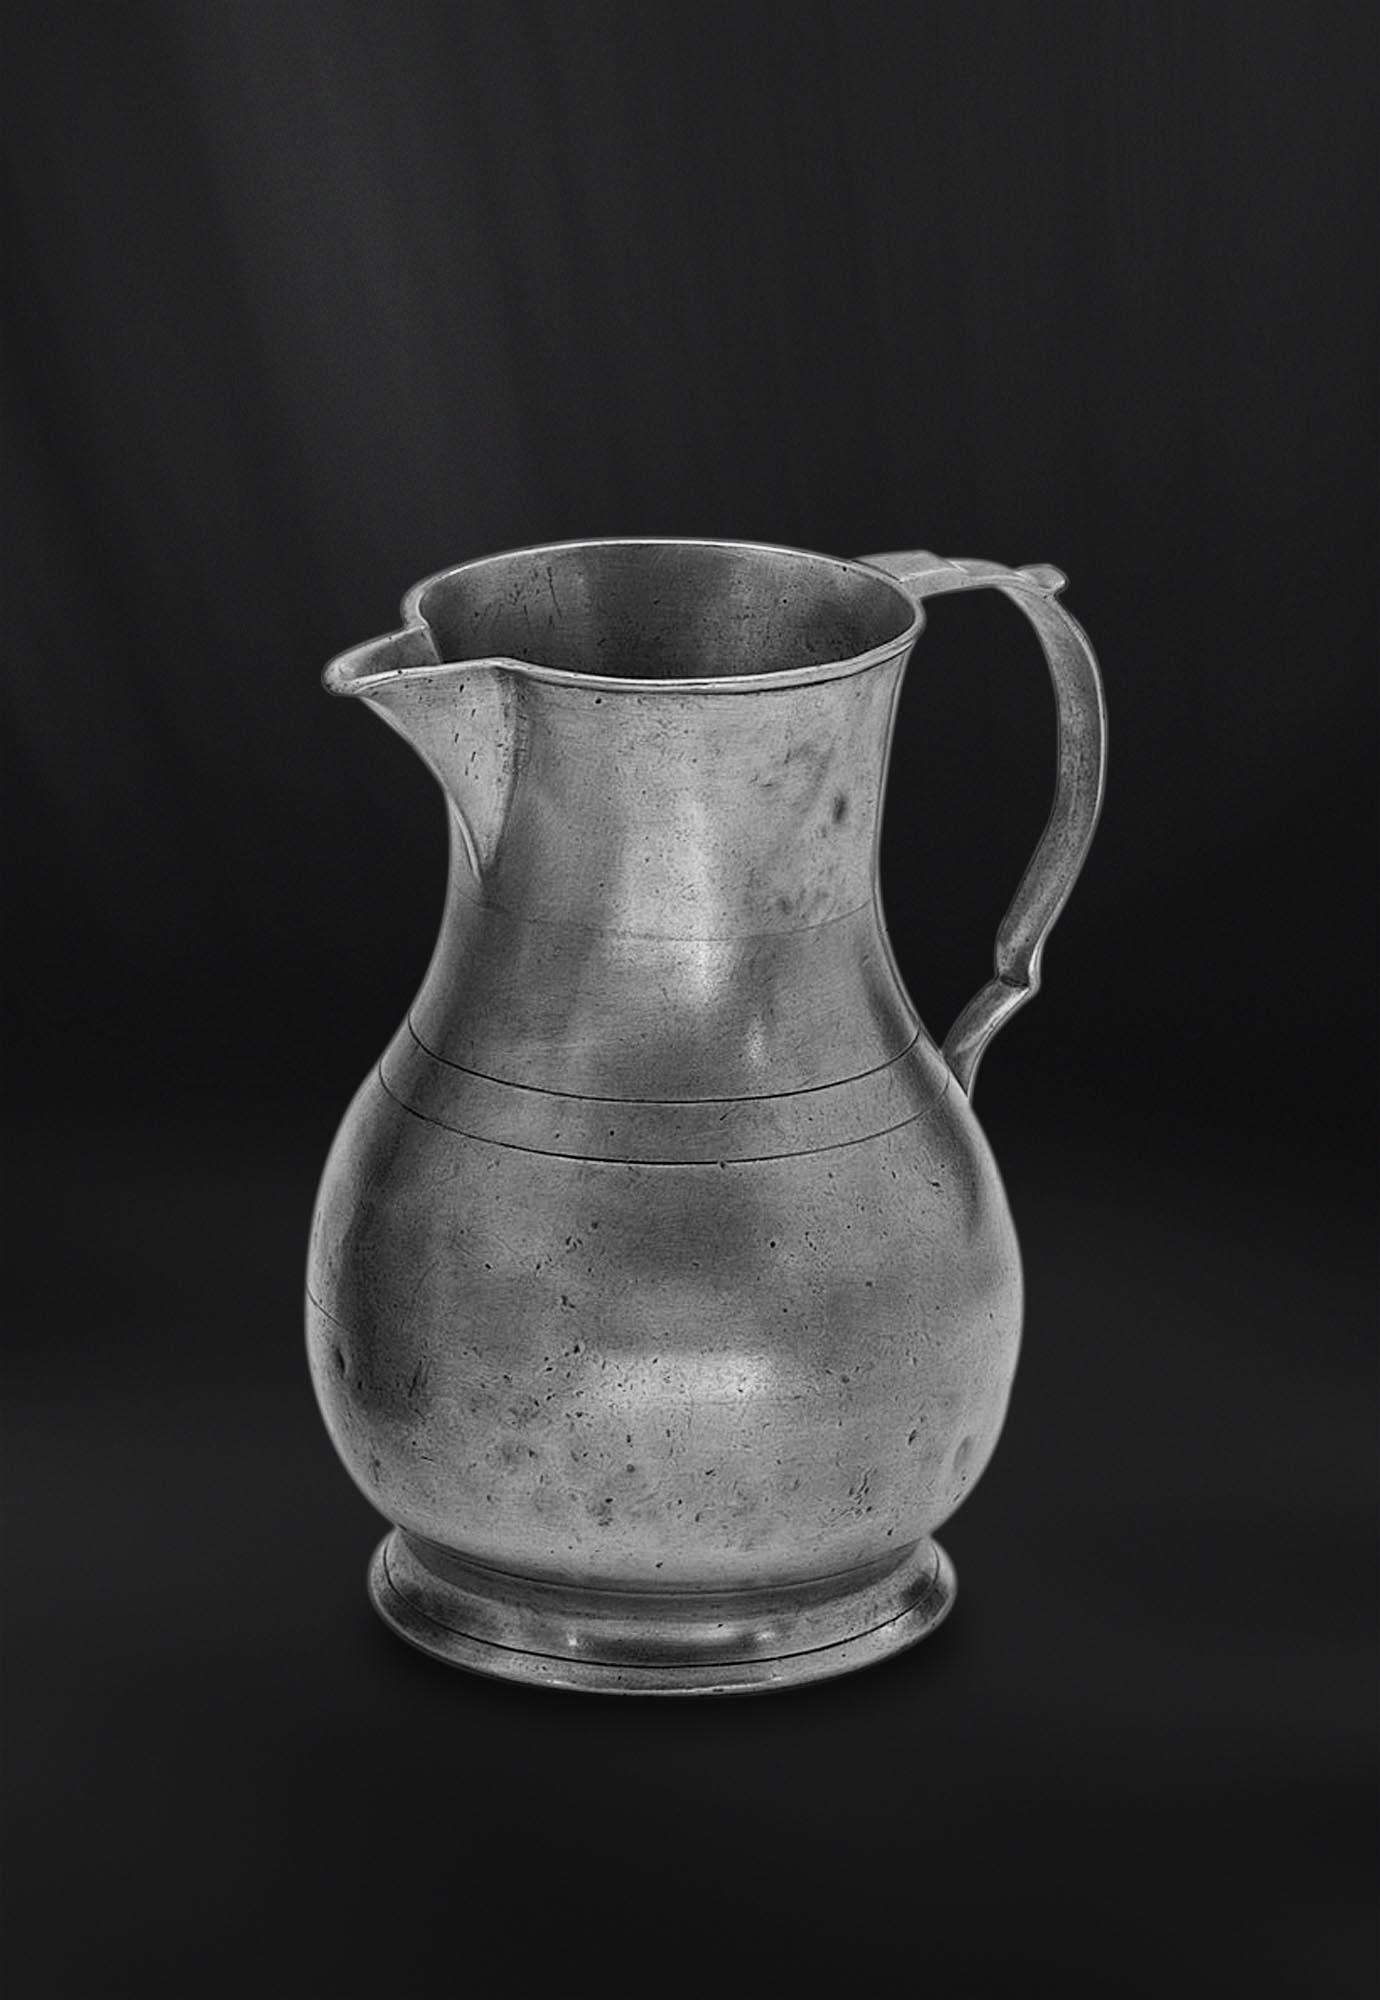 BROC CRUCHE PICHET etain antique